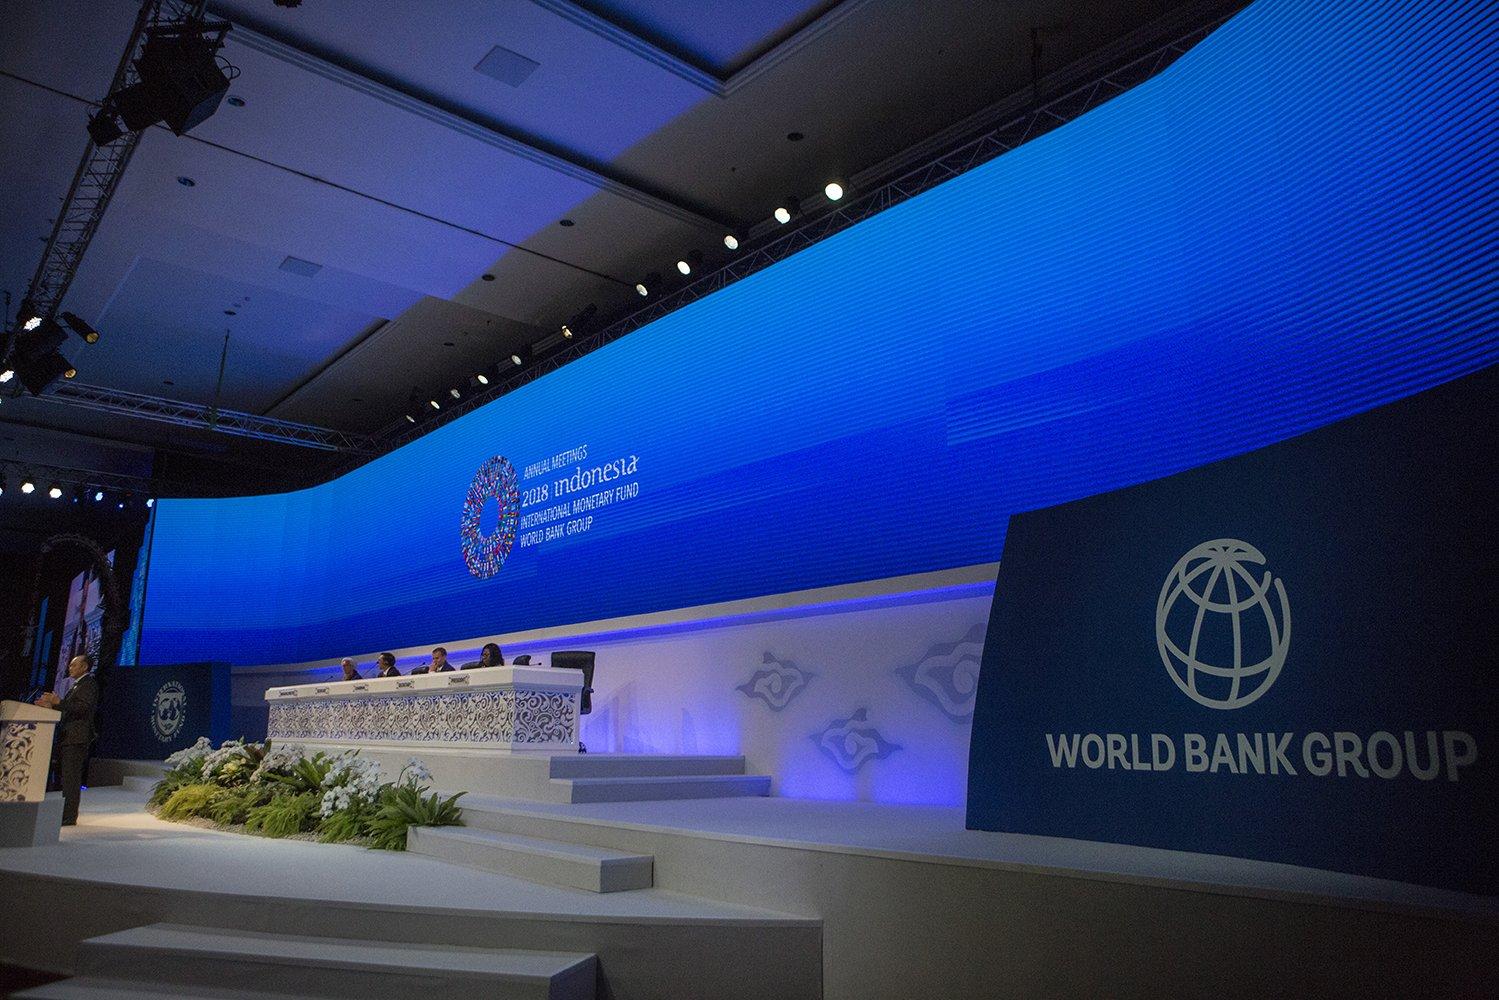 Presiden World Bank, Jim Yong Kim, menambahkan bahwa terdapat dua masalah yang dihadapi seluruh negara, kaya maupun miskin. Kedua masalah tersebut adalah perubahan iklim dan human capital.